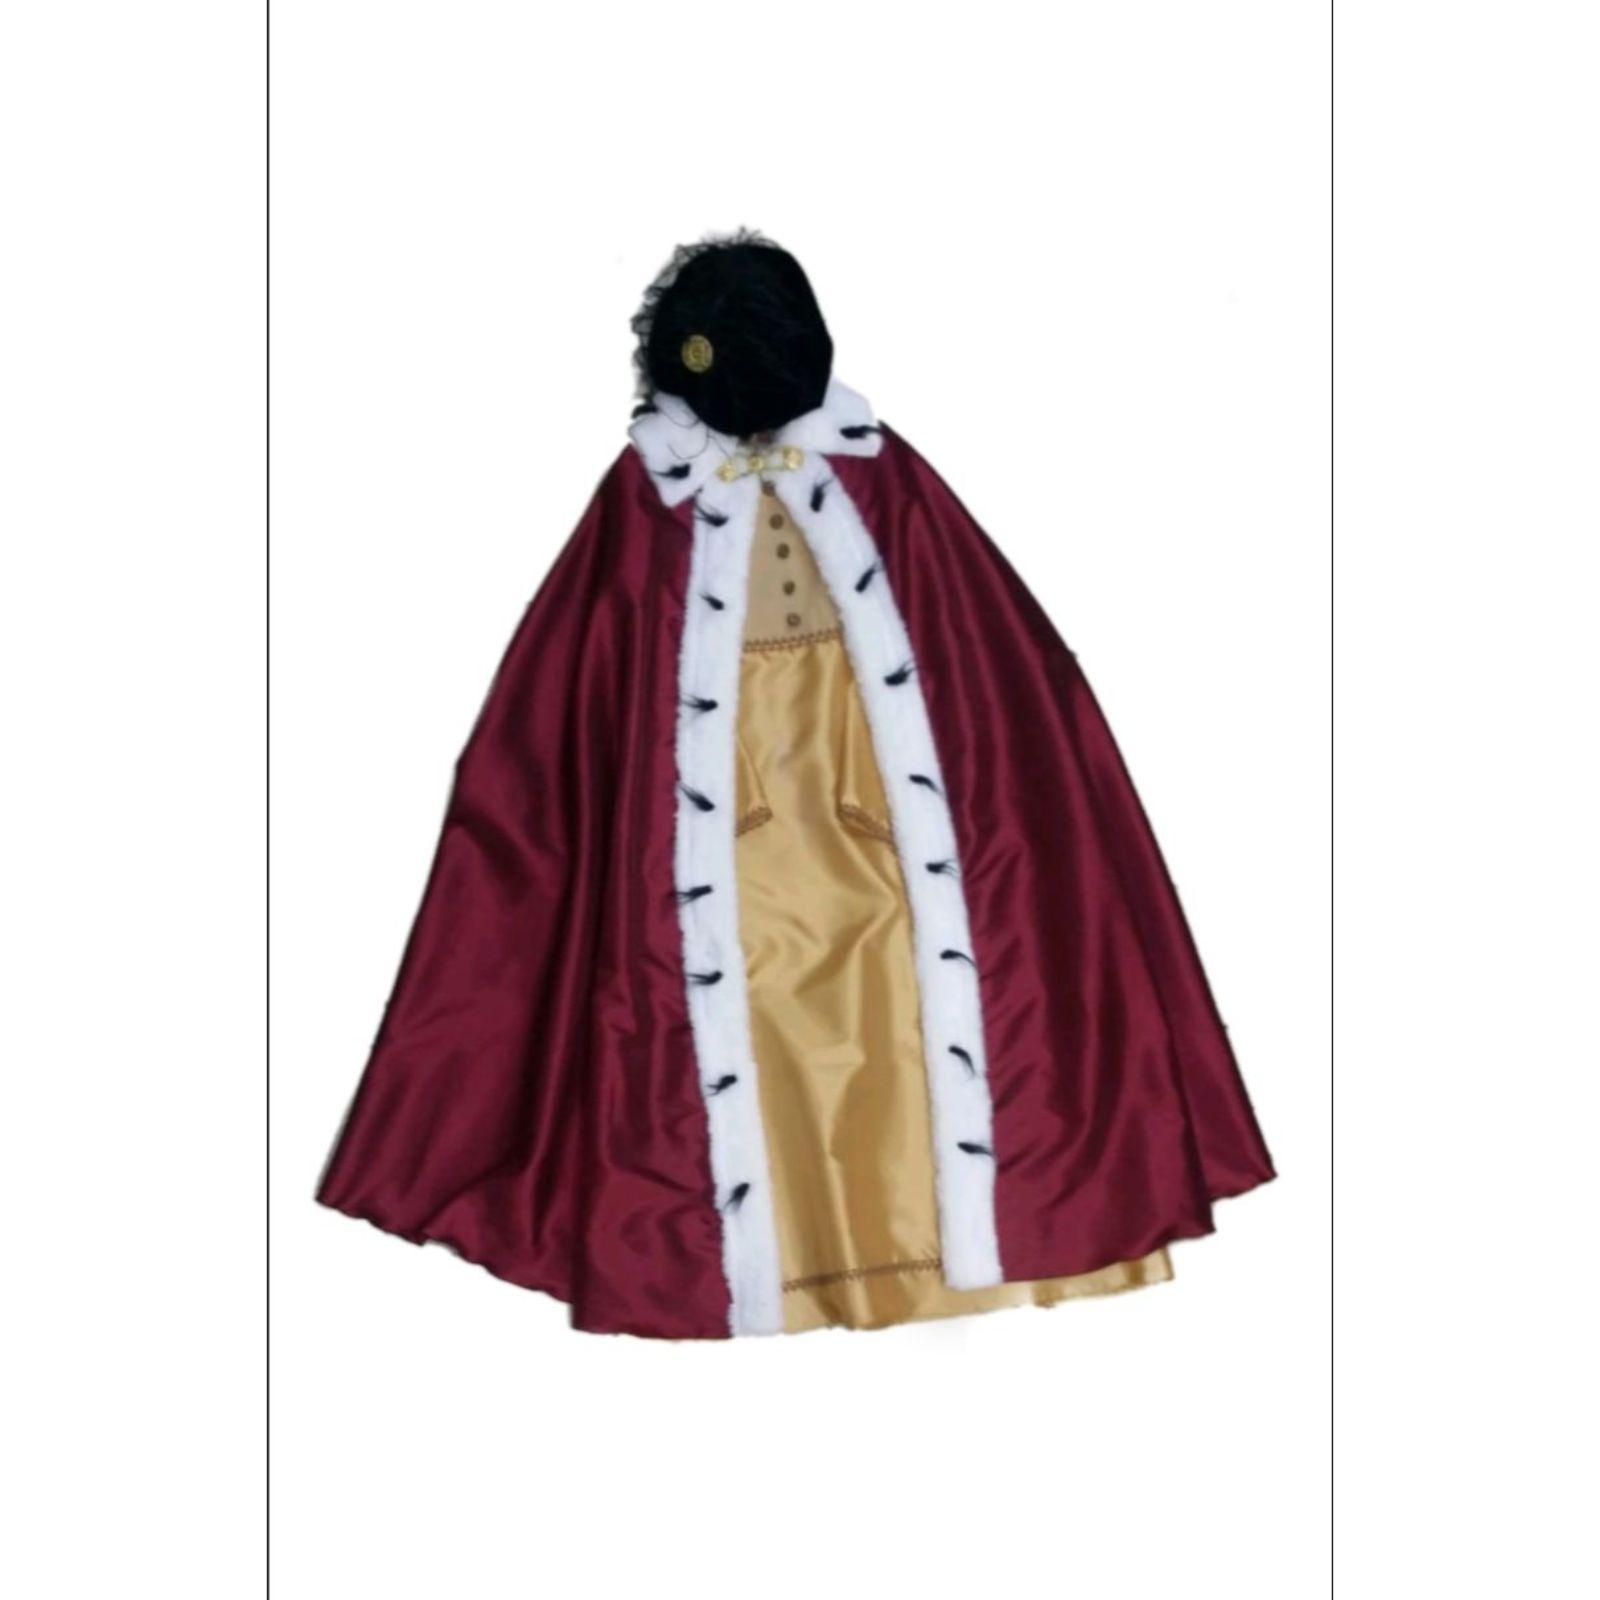 Costum Constantin Brâncoveanu 1